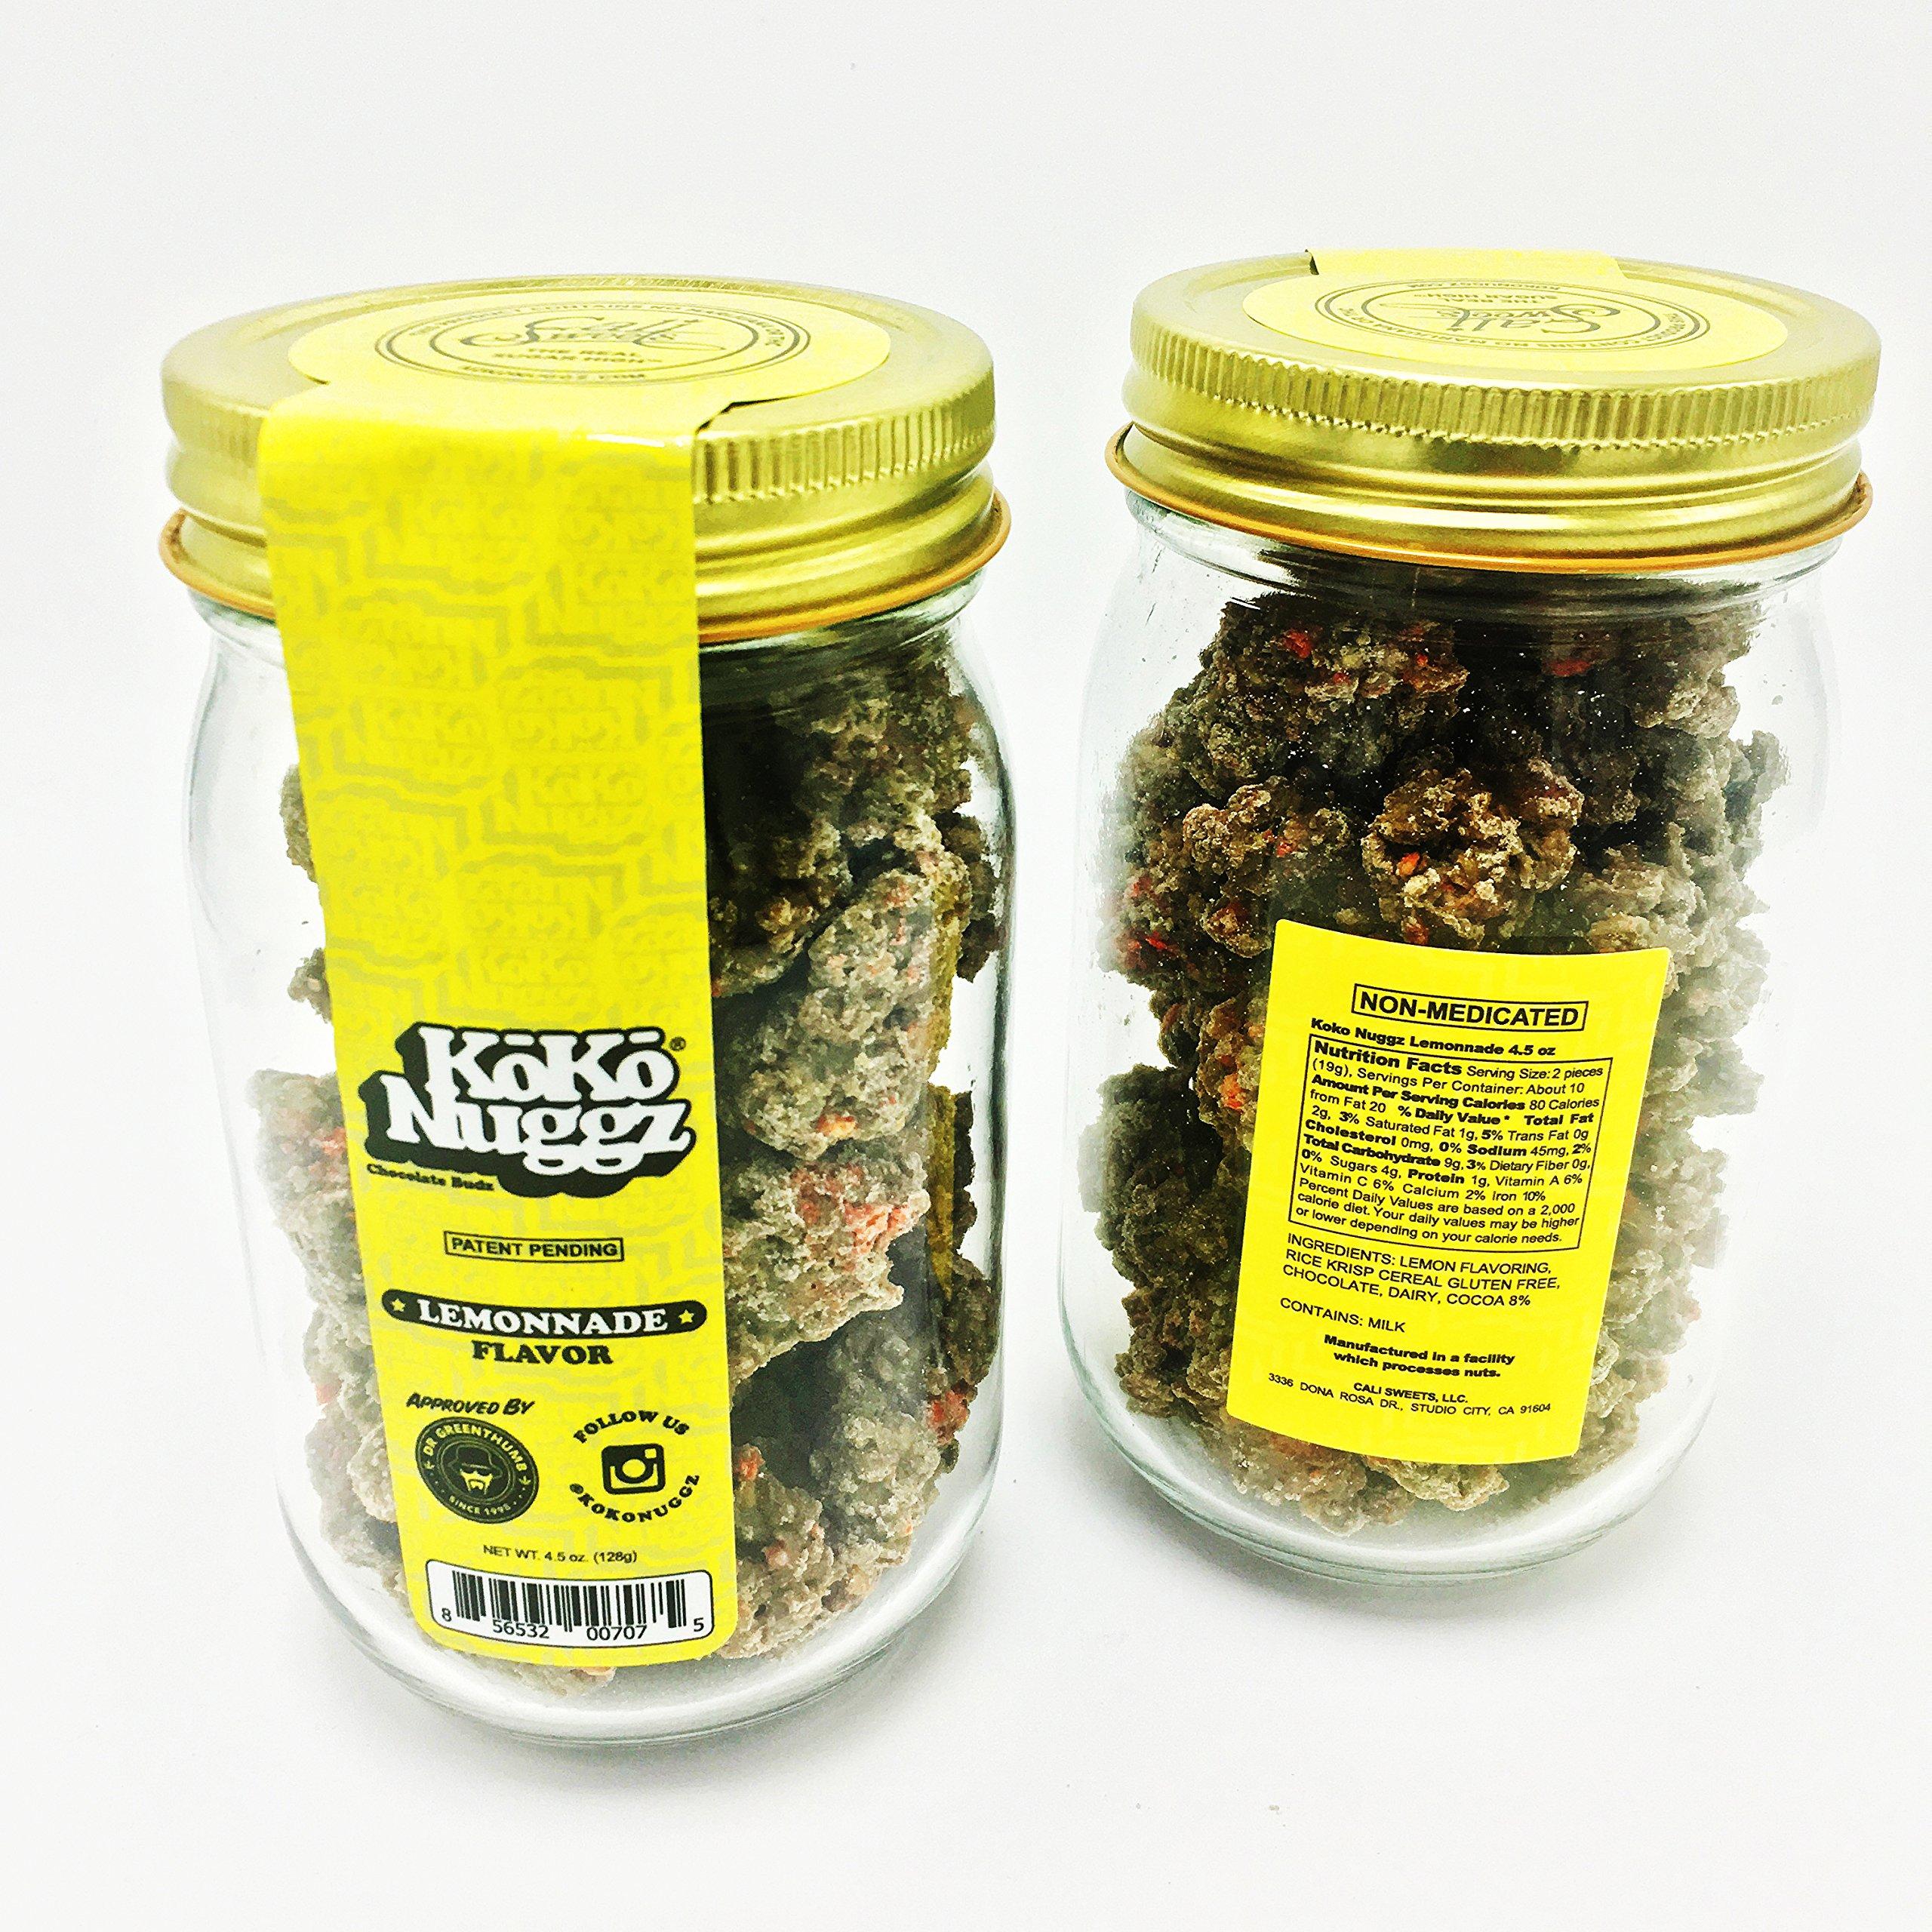 Koko Nuggz Chocolate Non Medicated BIG JAR (15 oz ) (Lemonnade) by Koko Nuggz